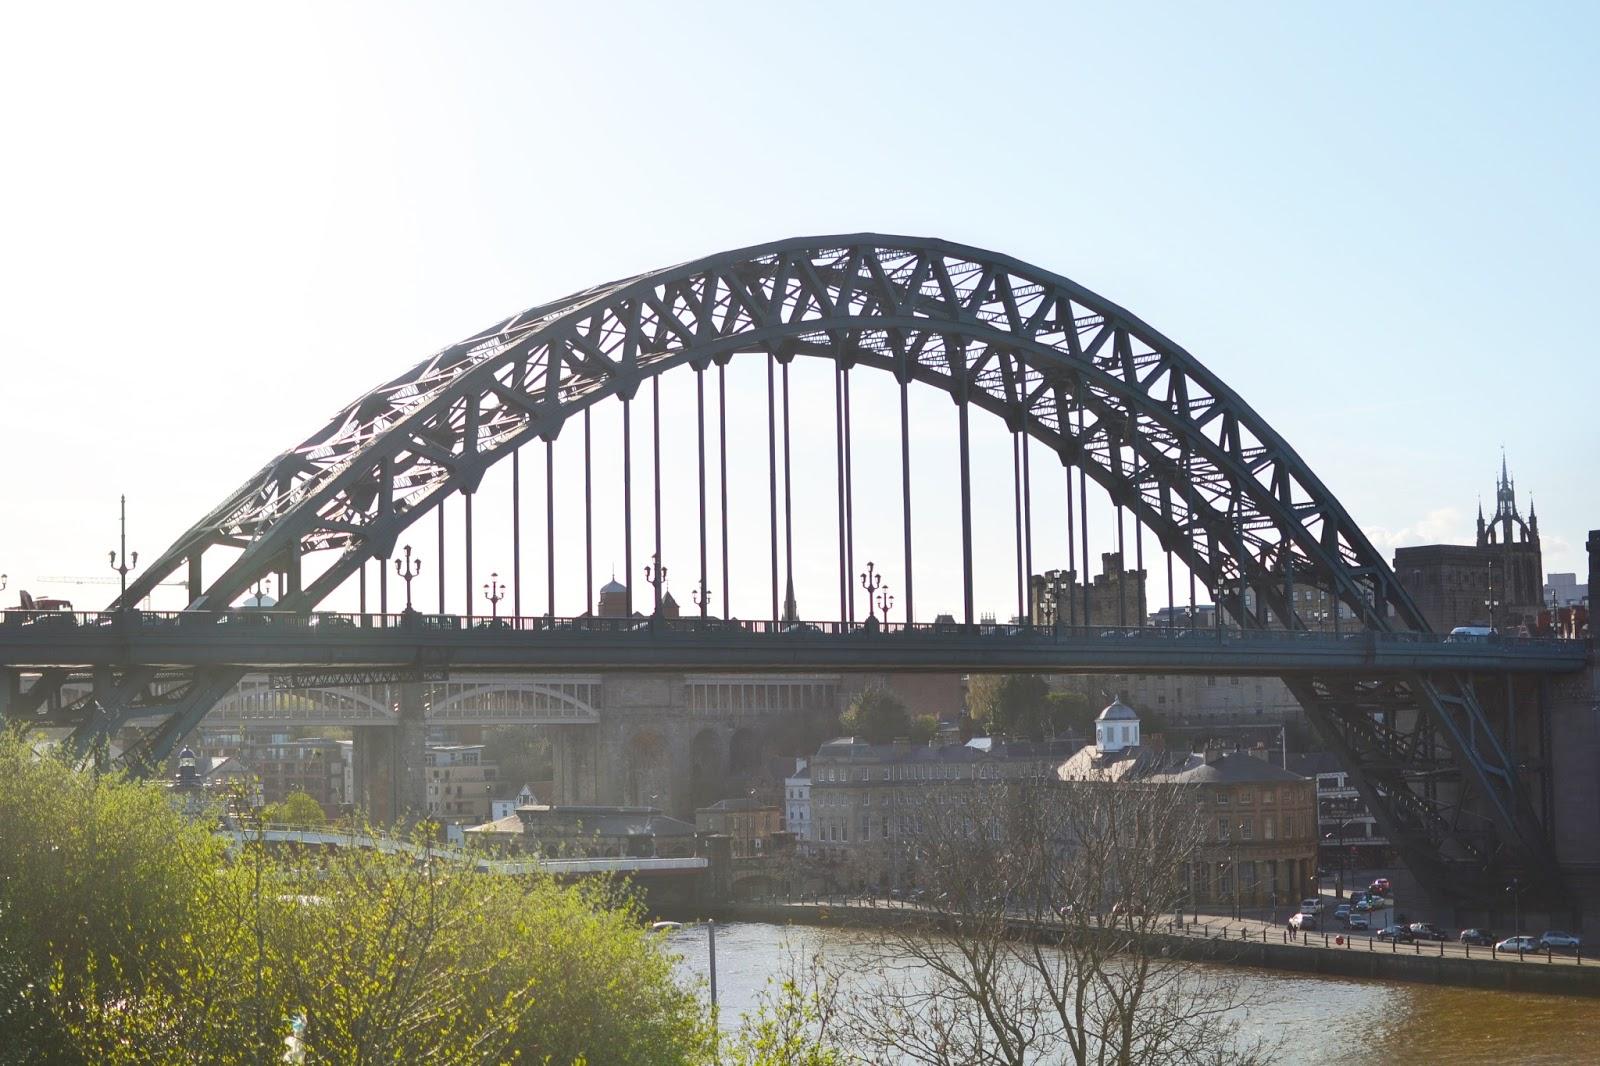 Tyne Bridge, Newcastle, things to do in newcastle